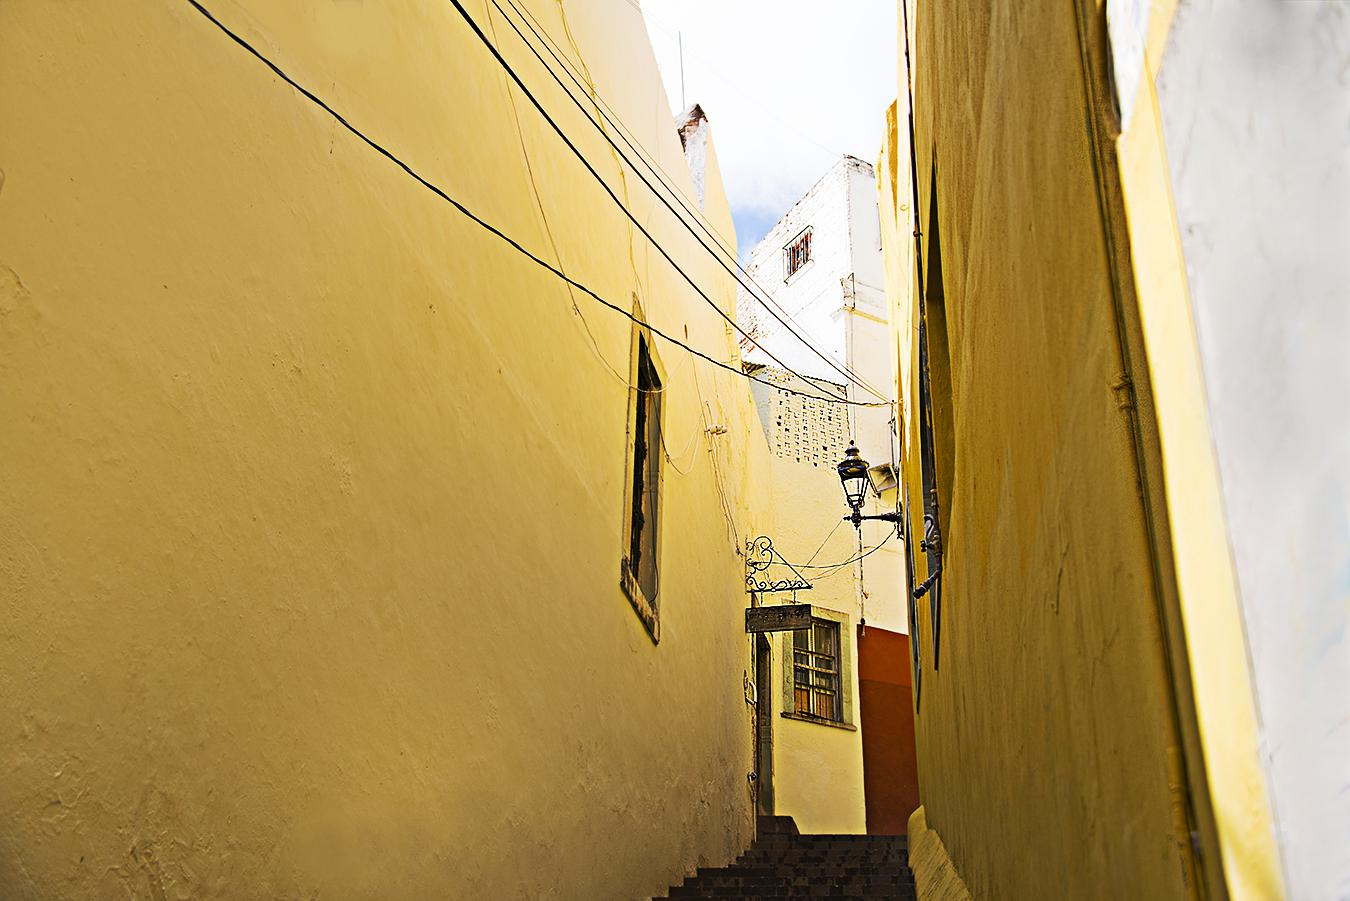 ZoeYunZou_Photography_Guanajuato_Mexico_2016_RichnessOfLif_SimpleJoyOfYellow_Color_Monochrome